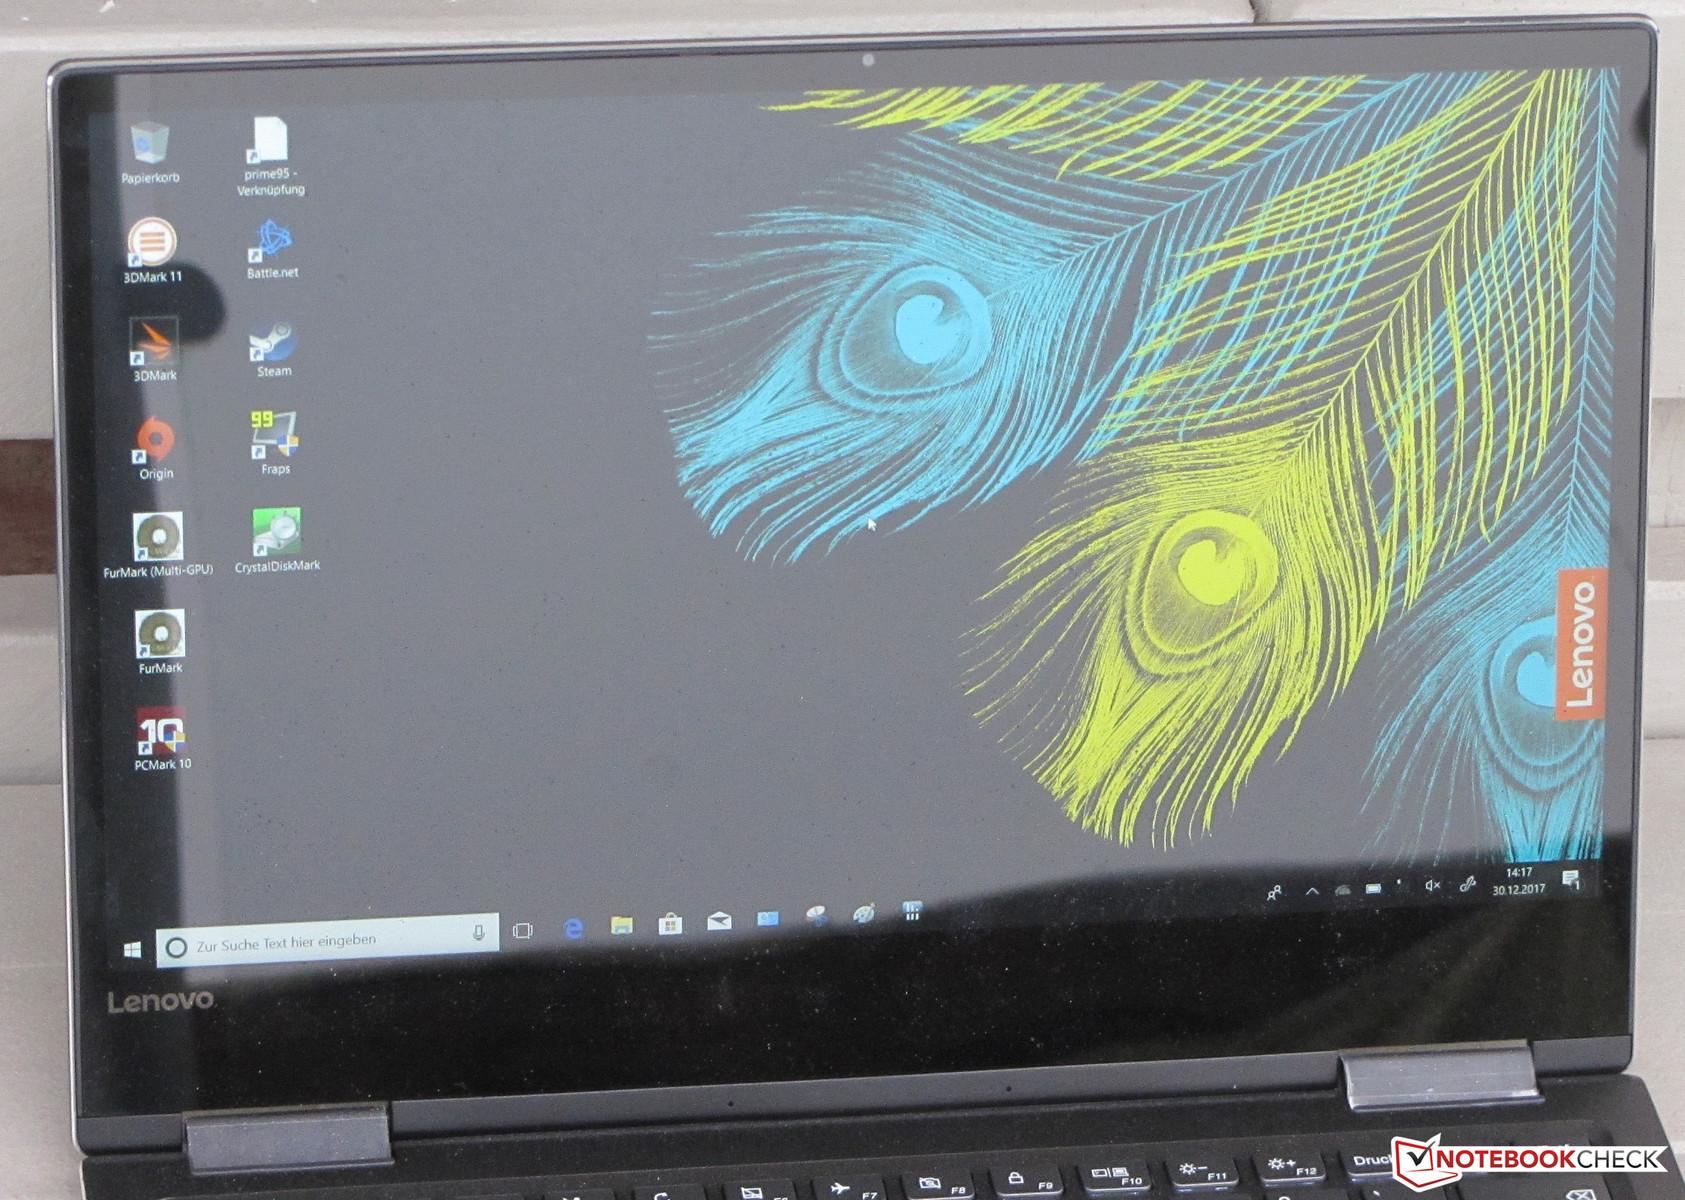 Lenovo Yoga 720-13IKB (i7-8550U, SSD, FHD) Convertible Review